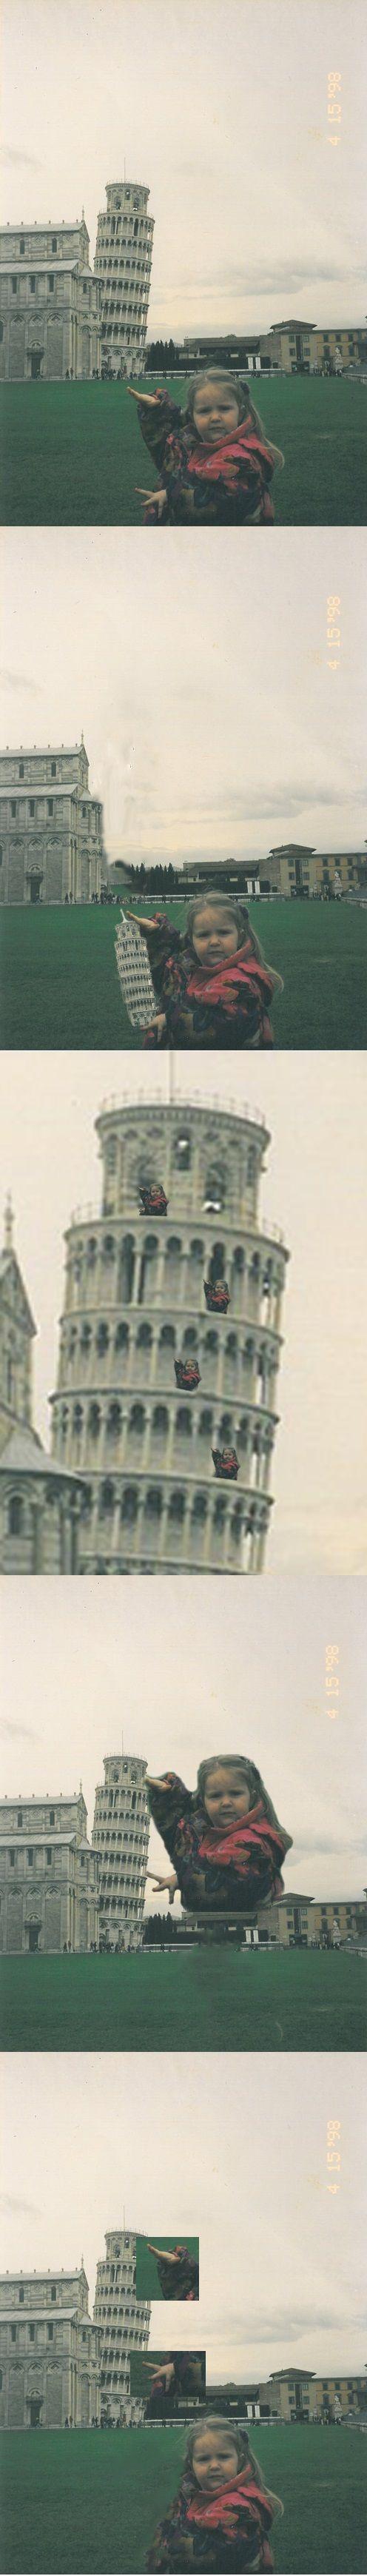 Ahhhhh morí mori mori mori mori! JAJAJAJAJAJA | #Nina #Foto #Photoshop #Girl #Italia #Torre #Pizza #tocar #pose #Day #Lol